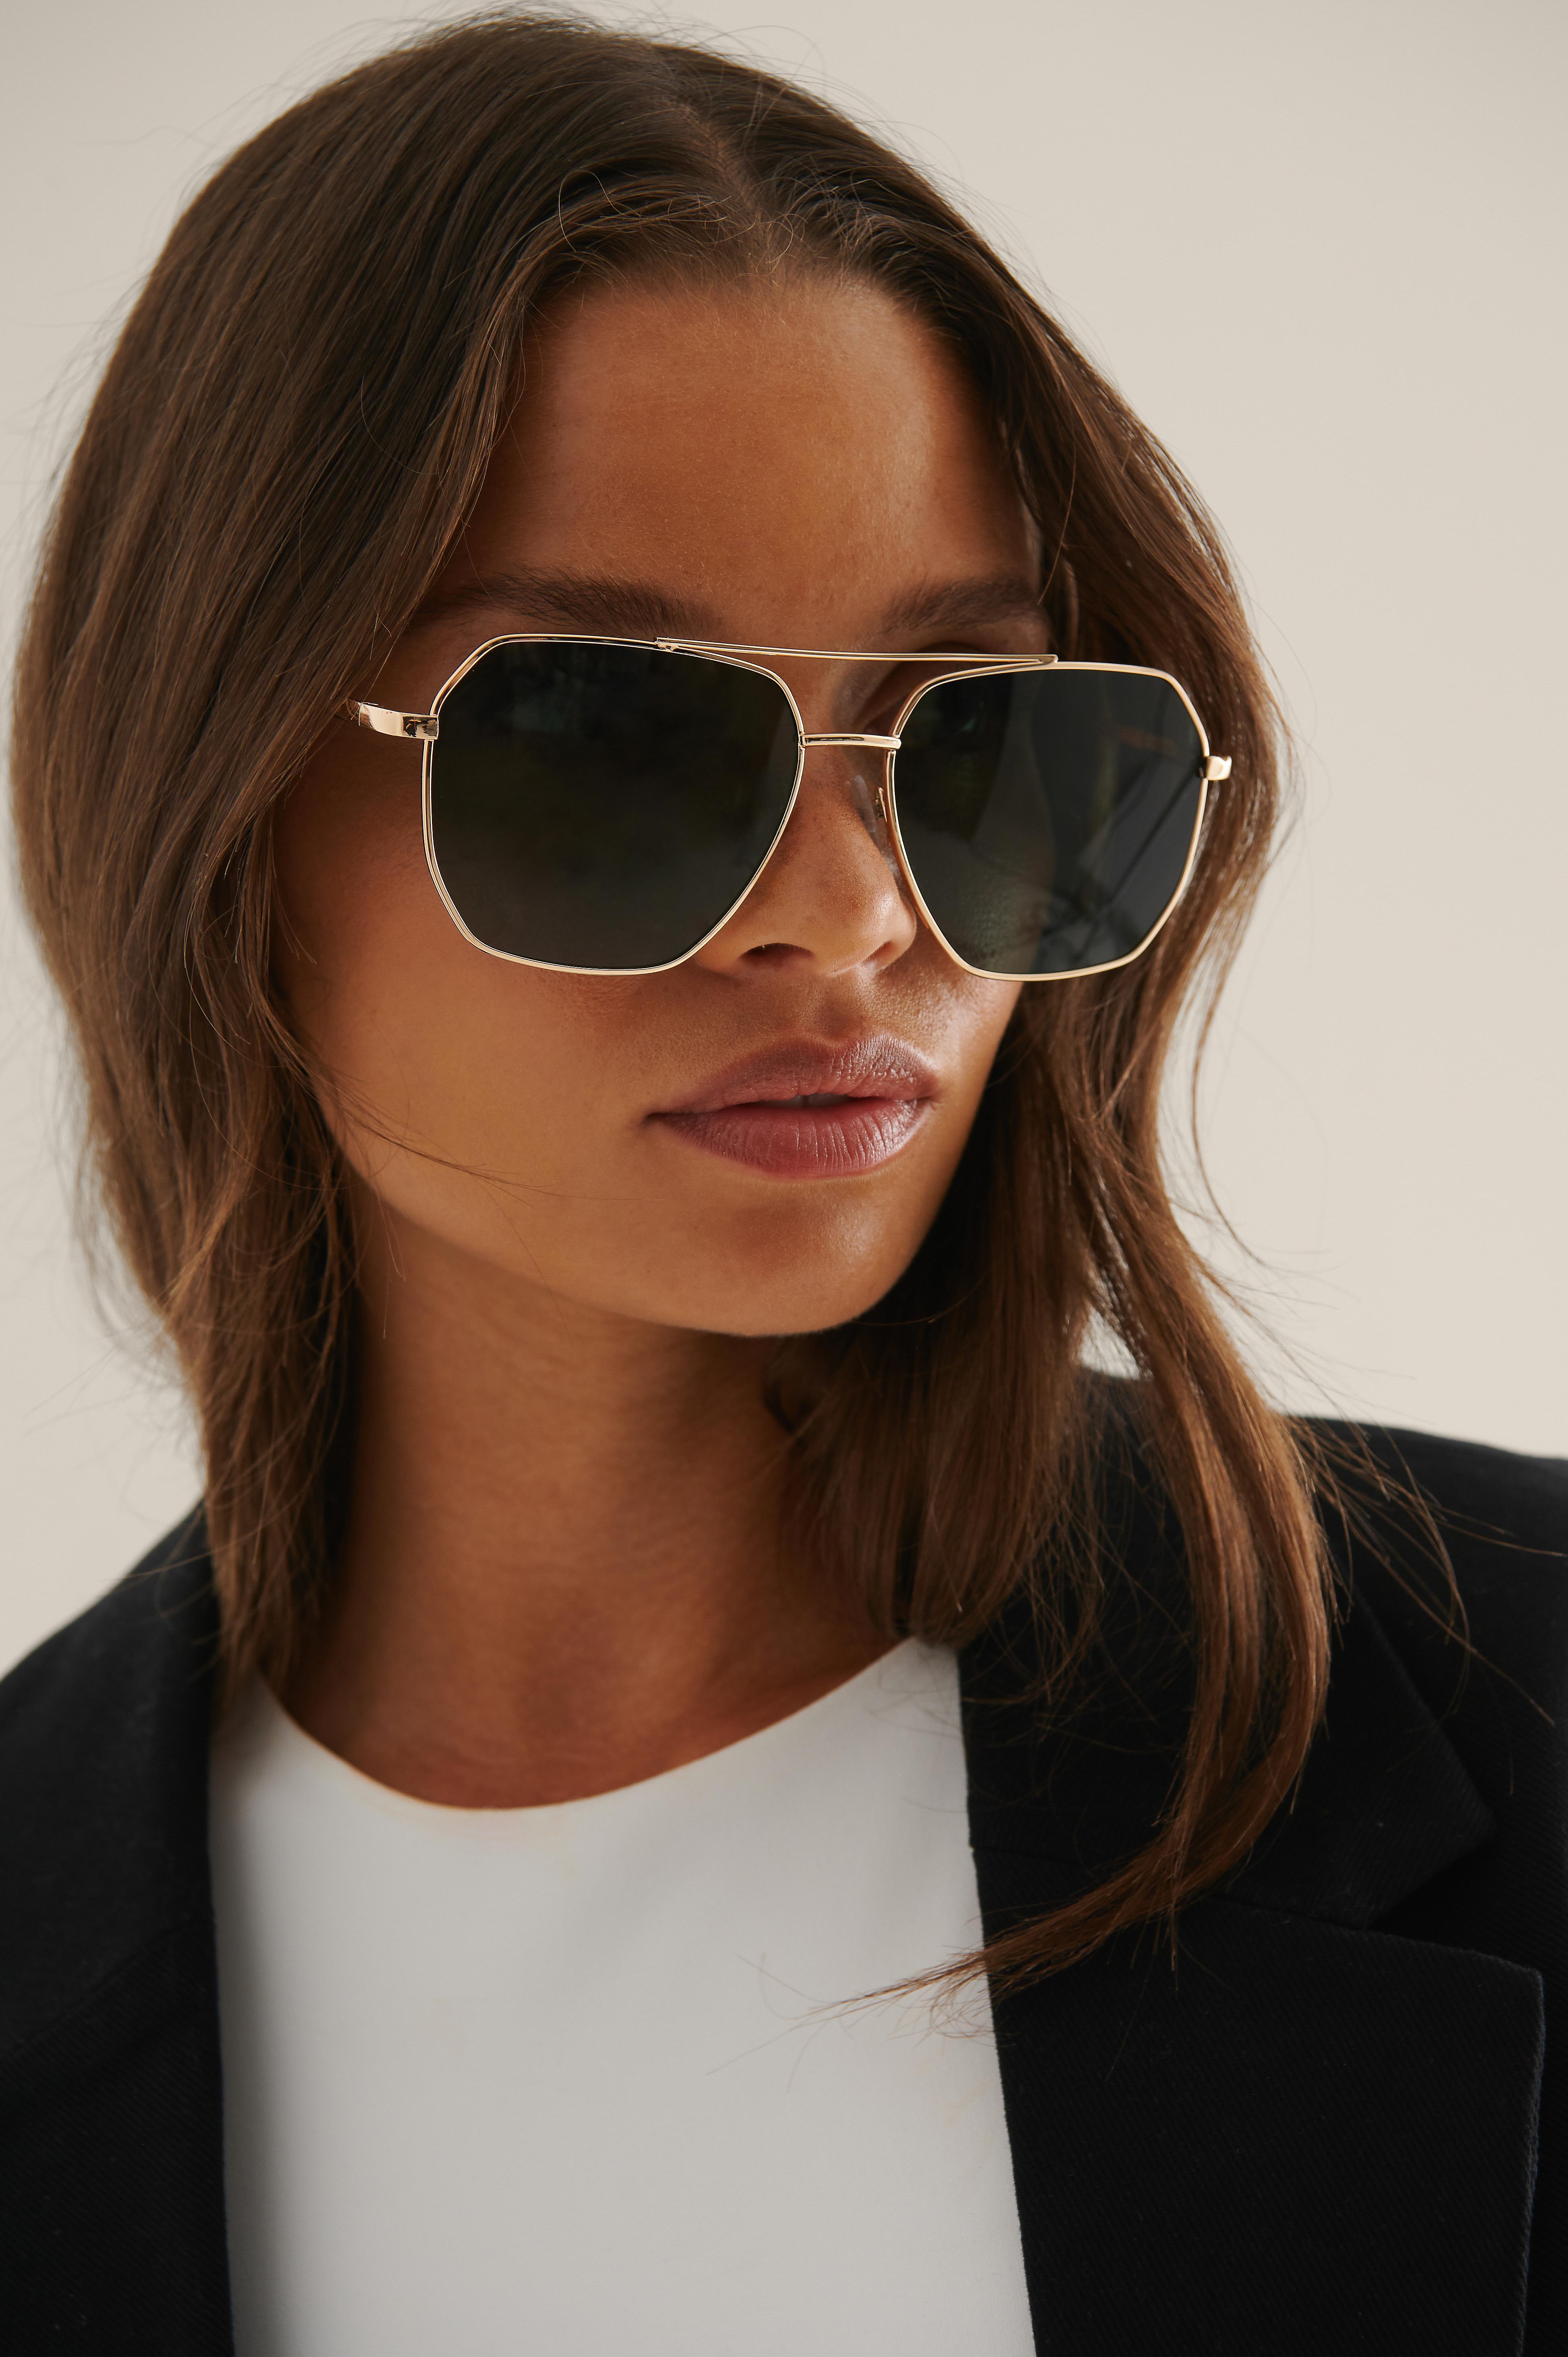 na-kd accessories -  Spitze Metall-Pilot-Sonnenbrille - Black